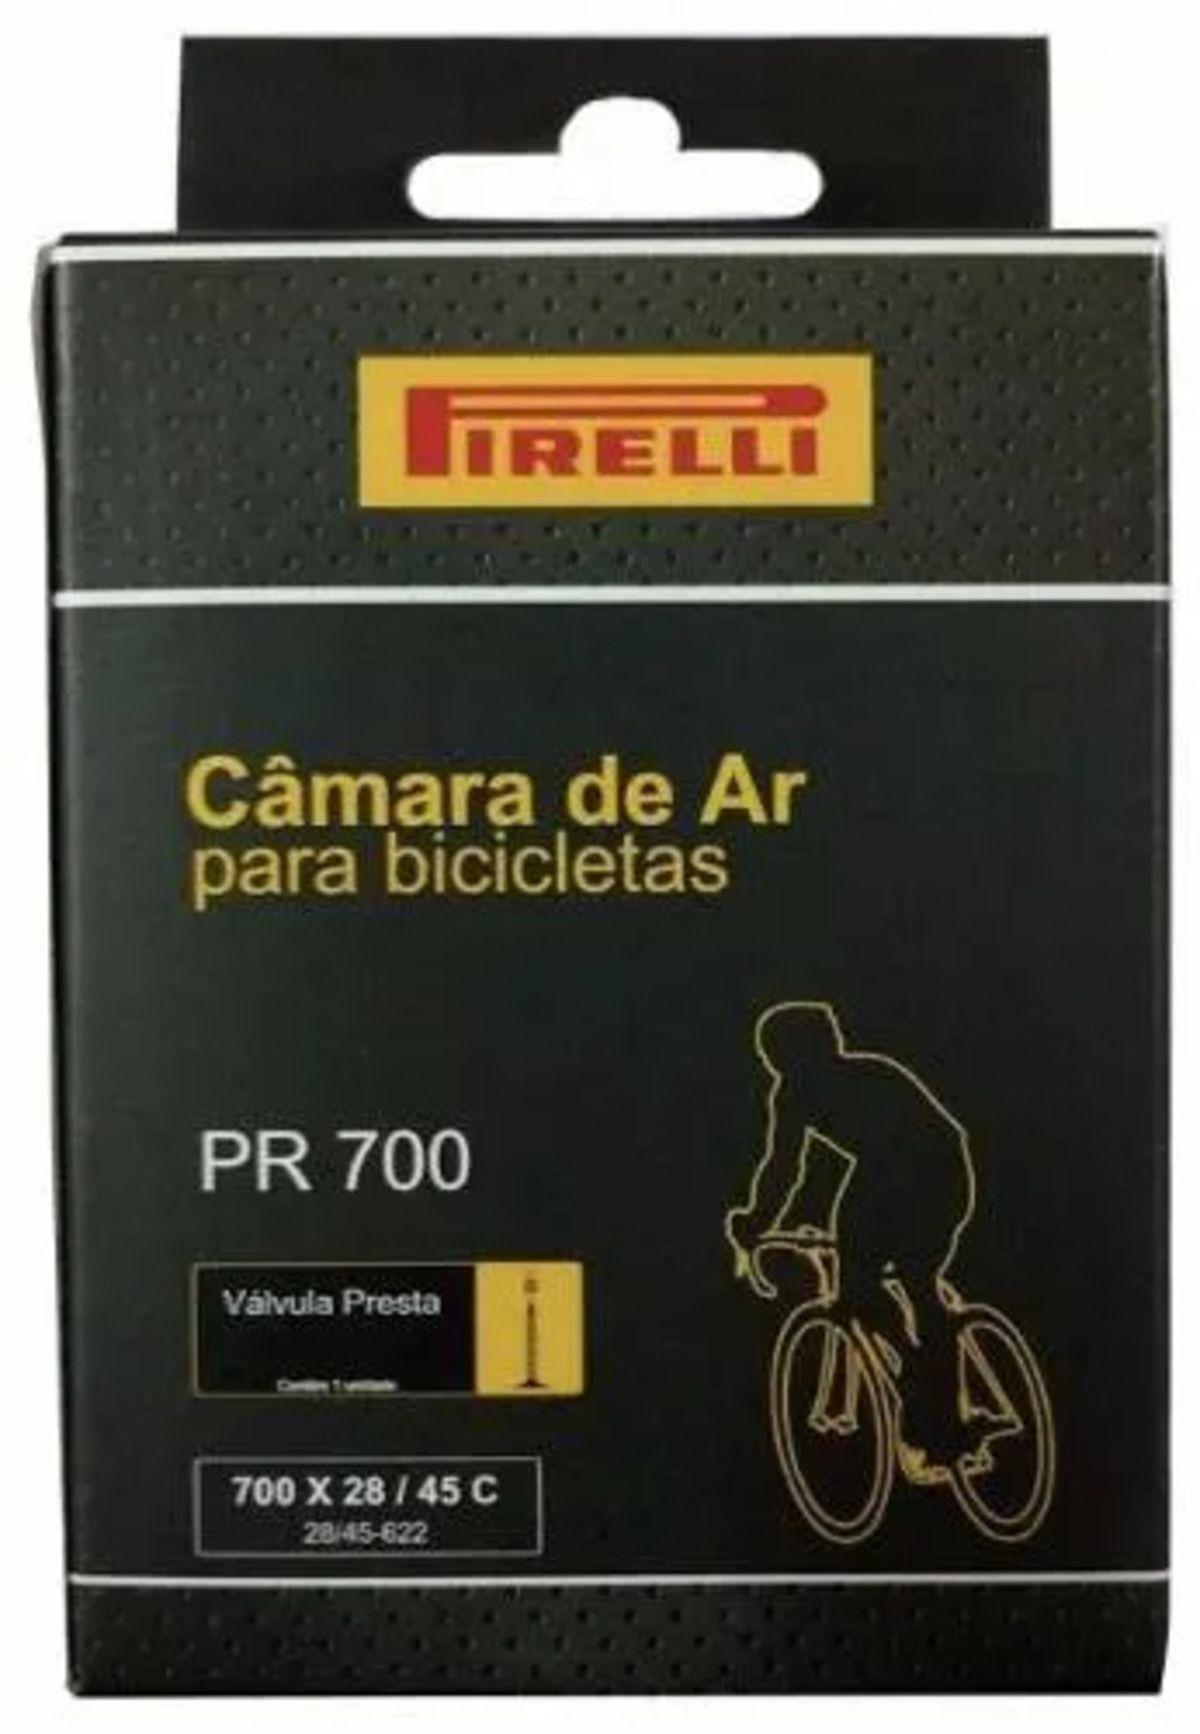 Kit Pneu Pirelli Touring Aramado 700x45 com Câmara Pirelli 700